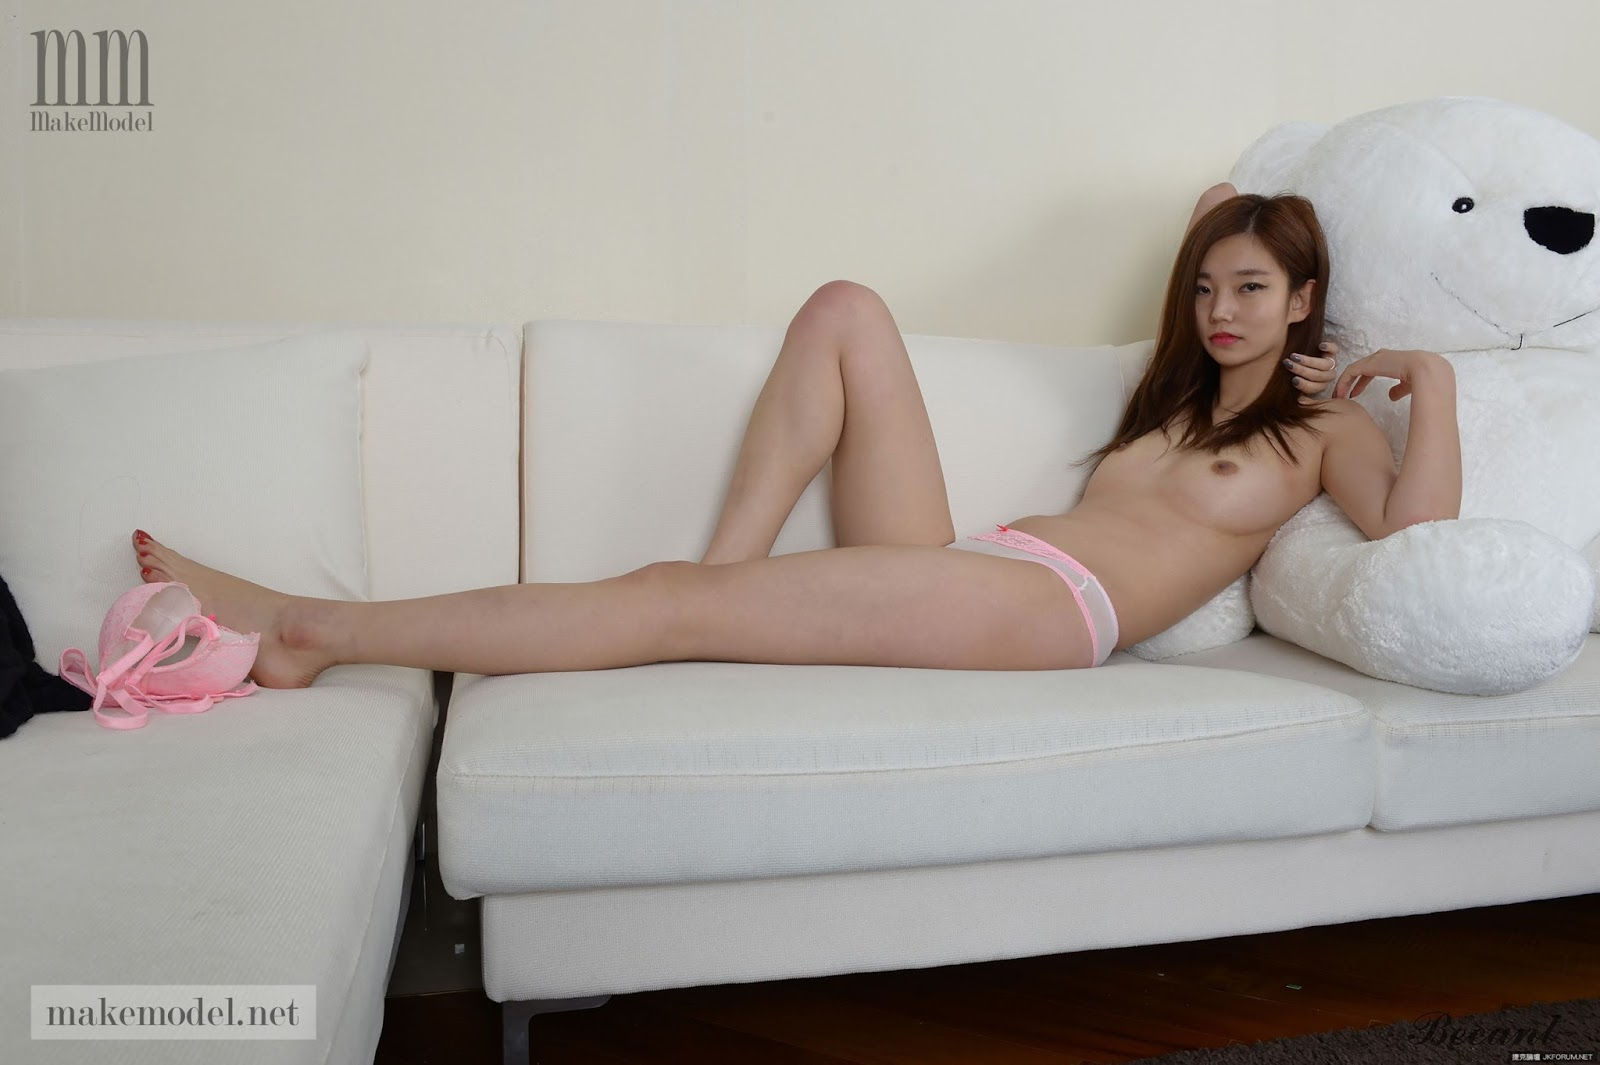 270912 3473 - Korean Nude - Big Albom Remain #A-korean girl